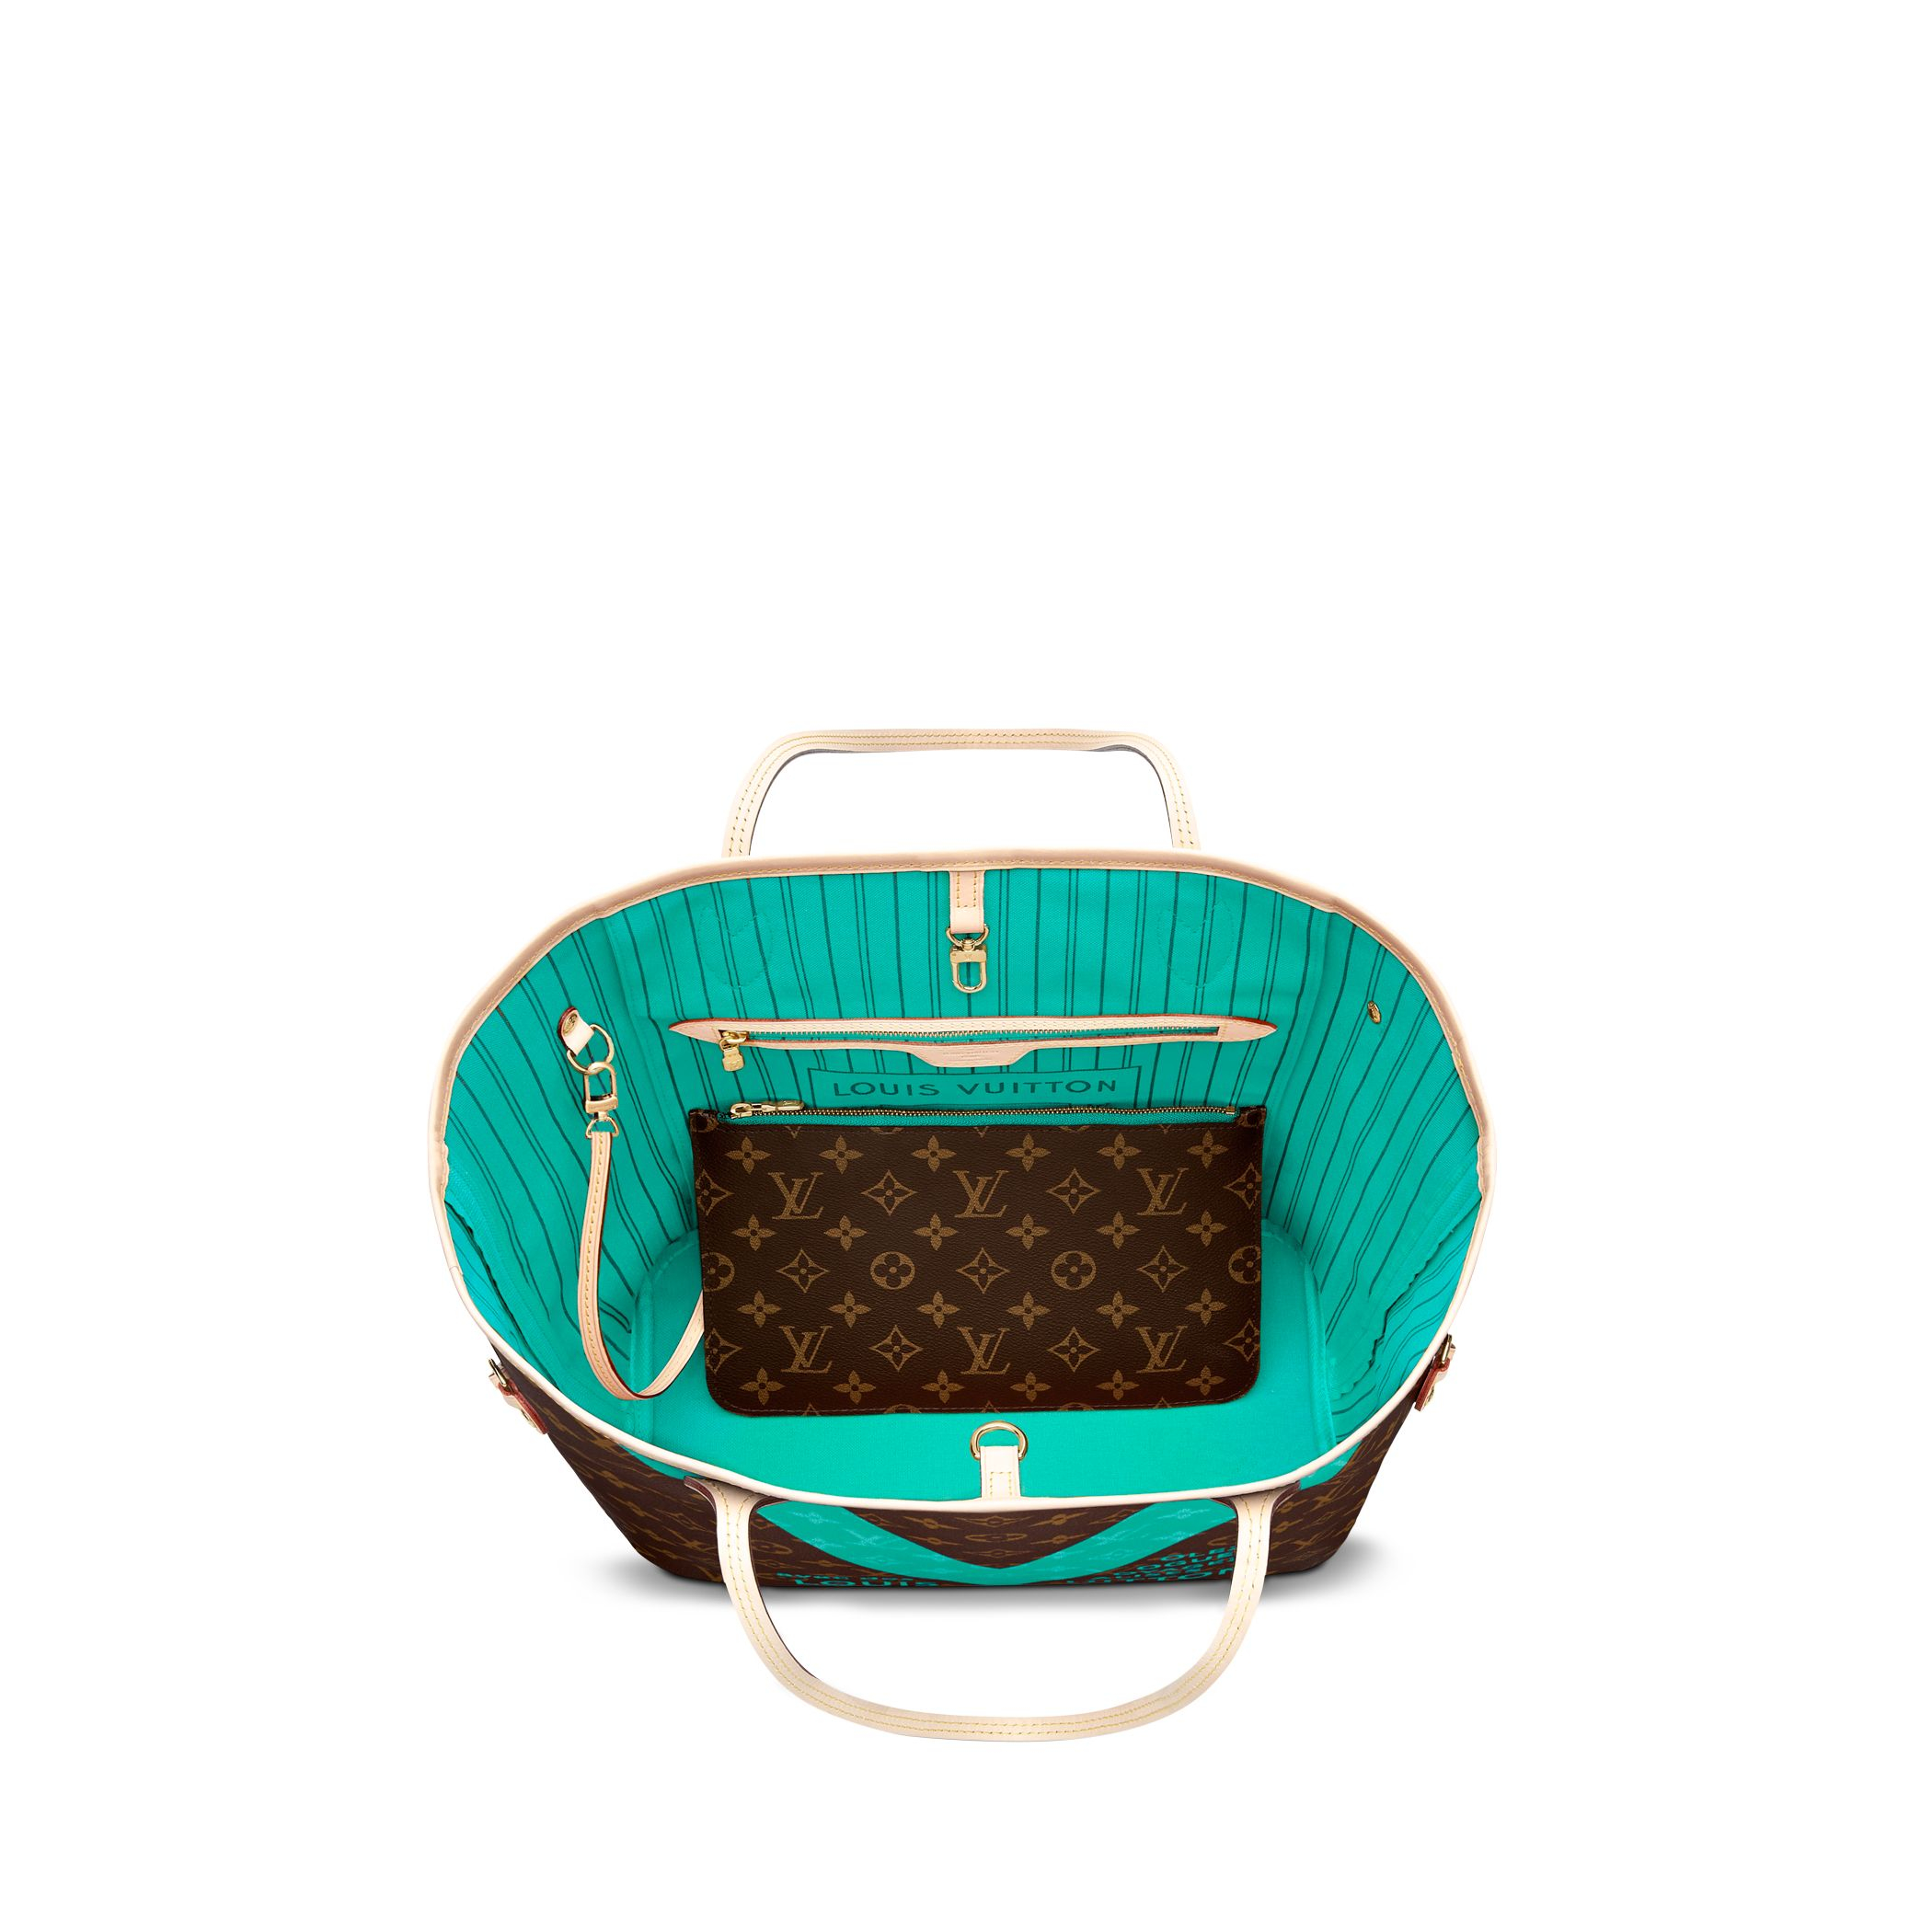 cb554684fbb5 Sac A Main Louis Vuitton Neverfull Mm - Helen Connors Blog